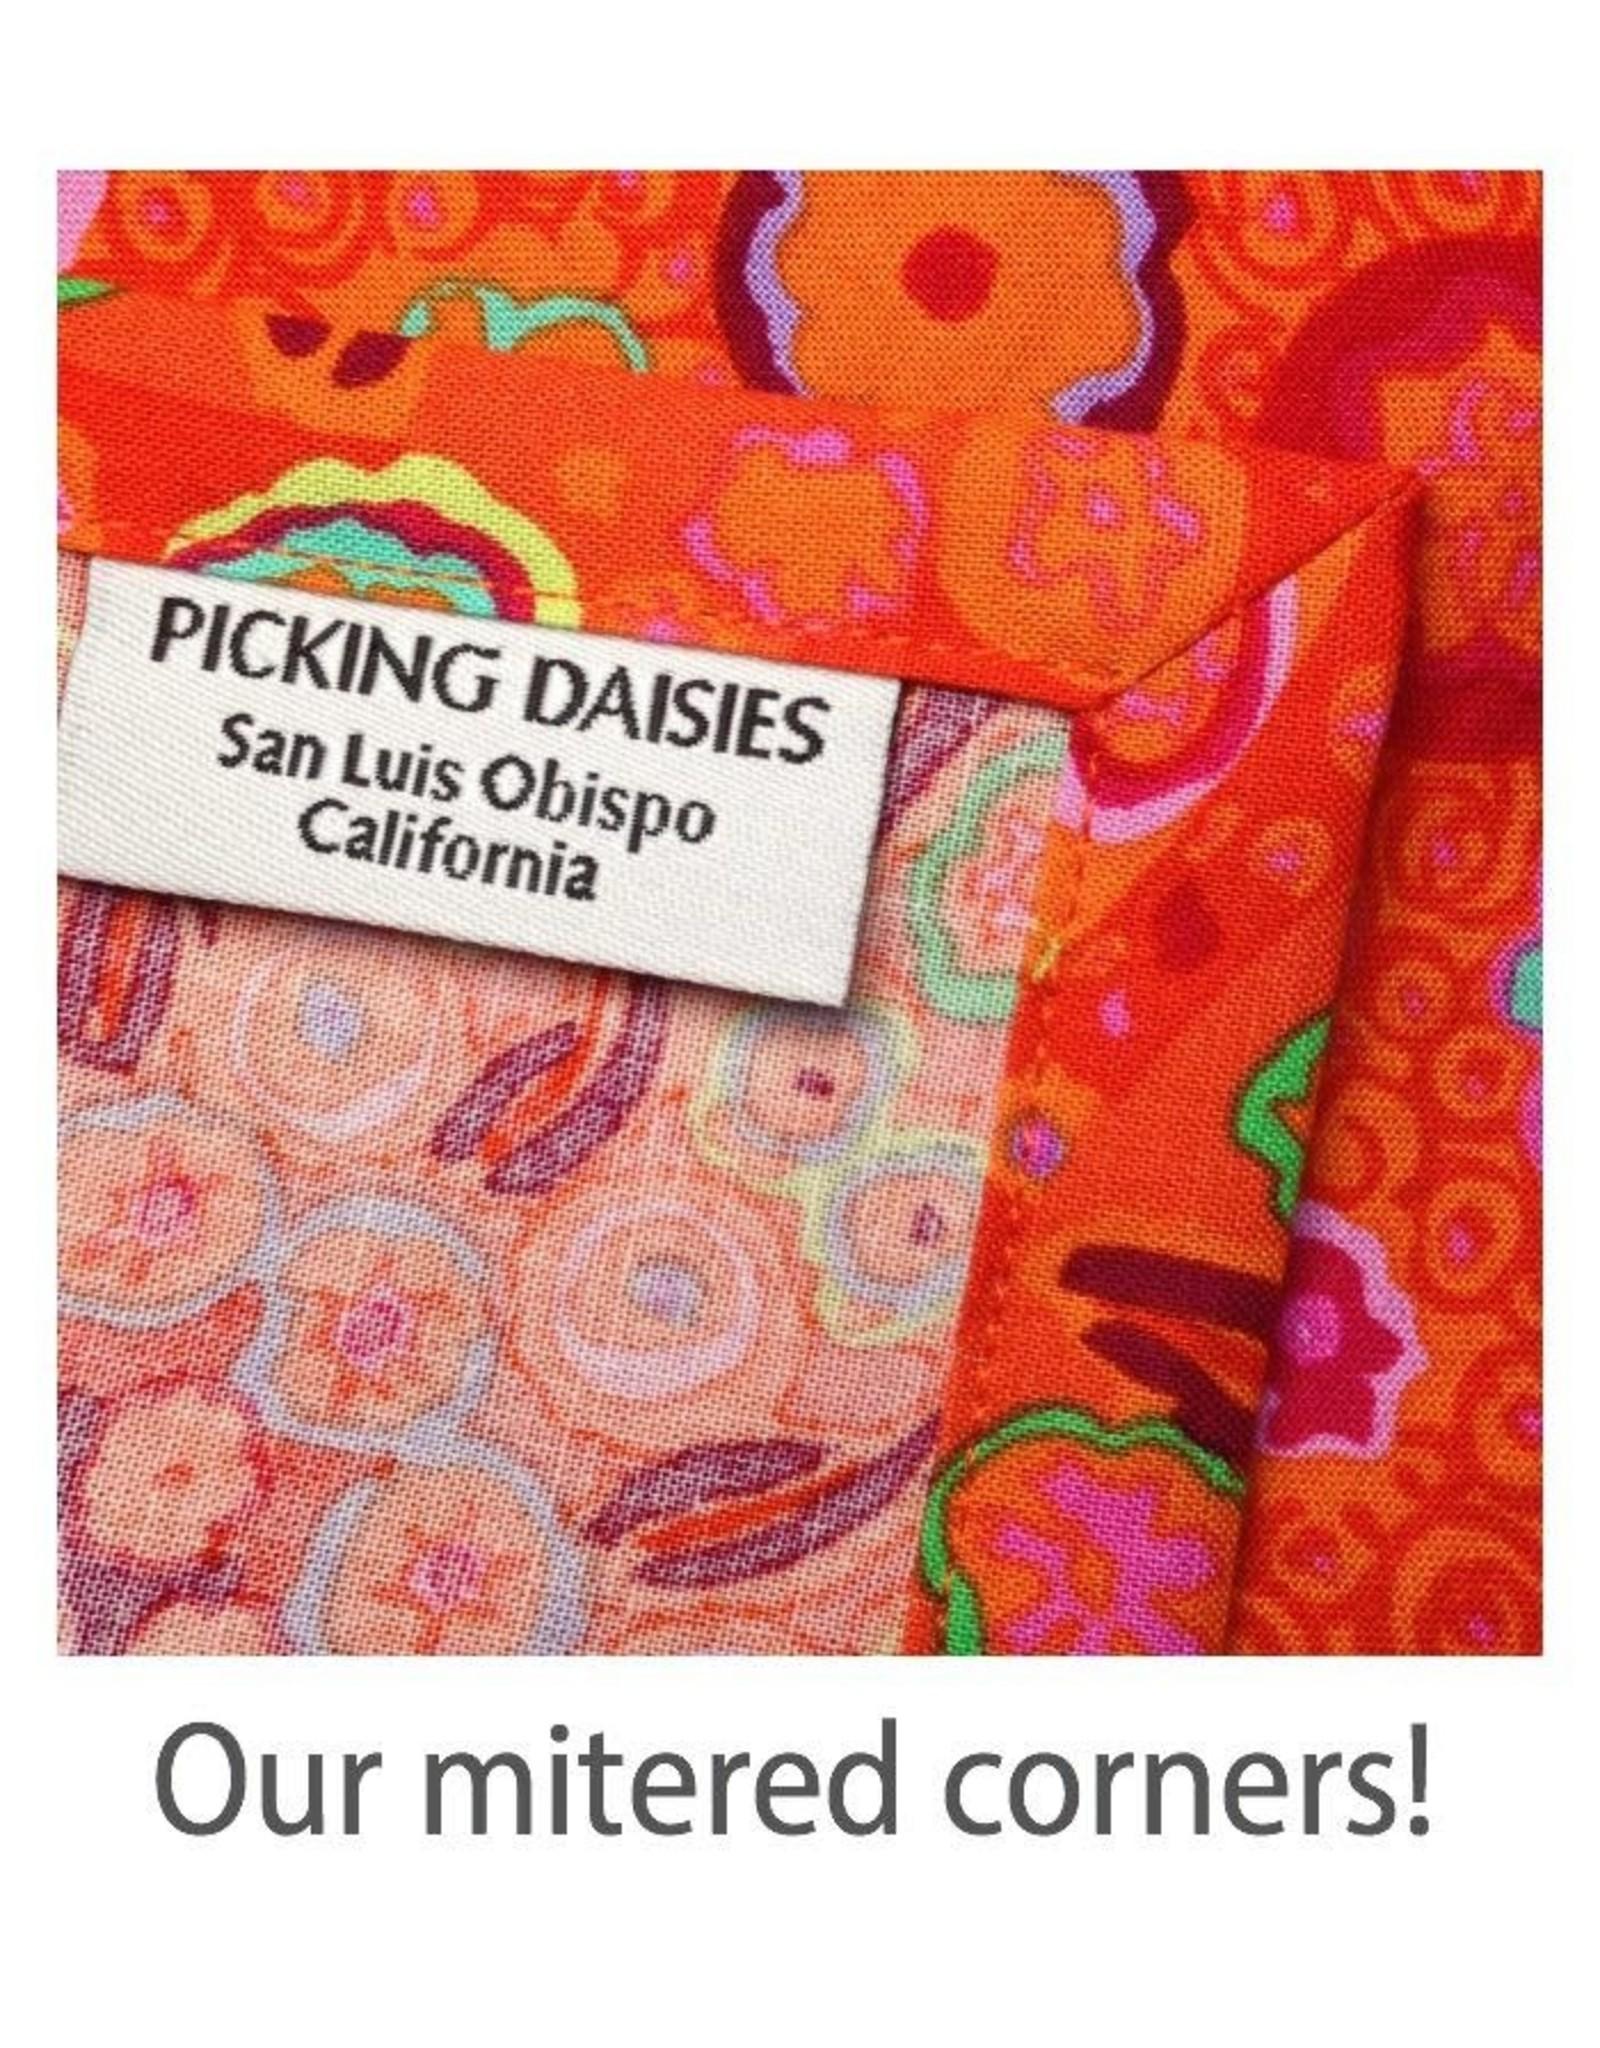 PD's William Morris Collection Orkney, Melsetter in Indigo, Dinner Napkin